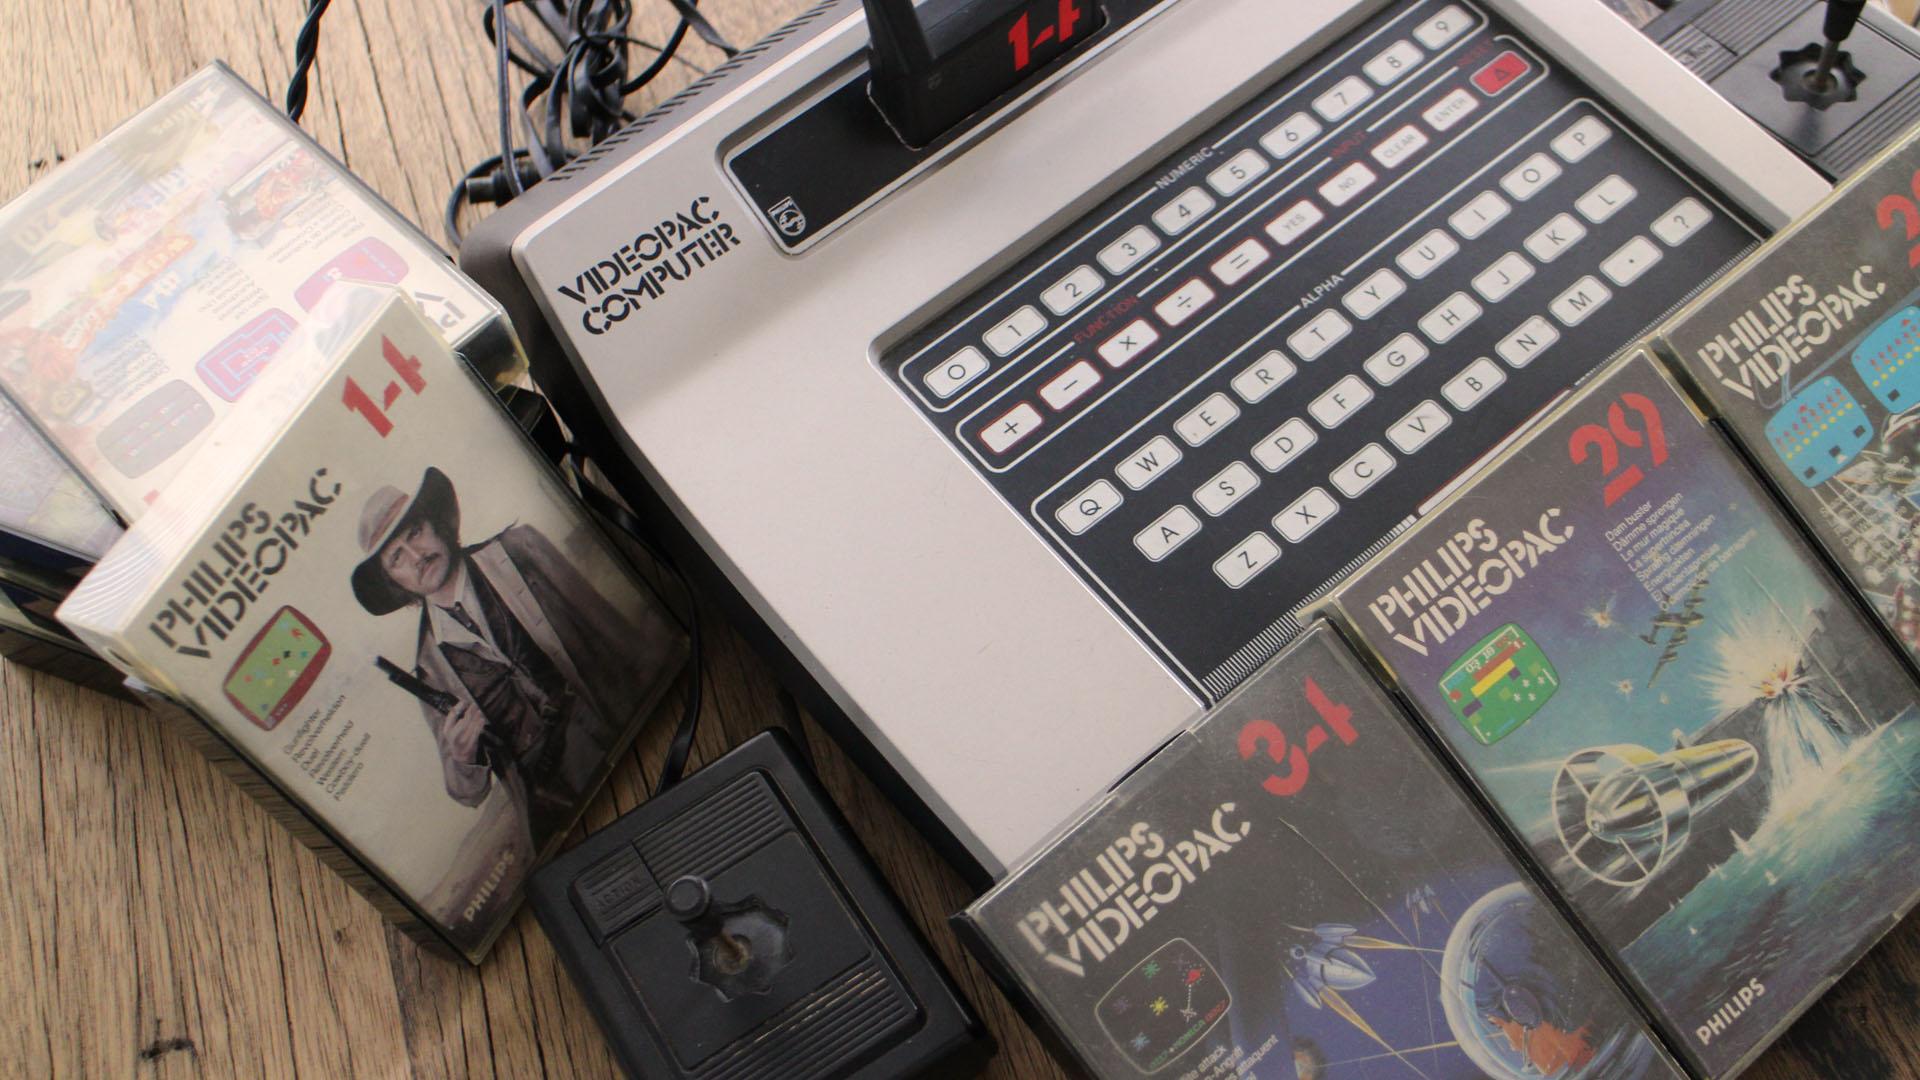 Videopac G7000